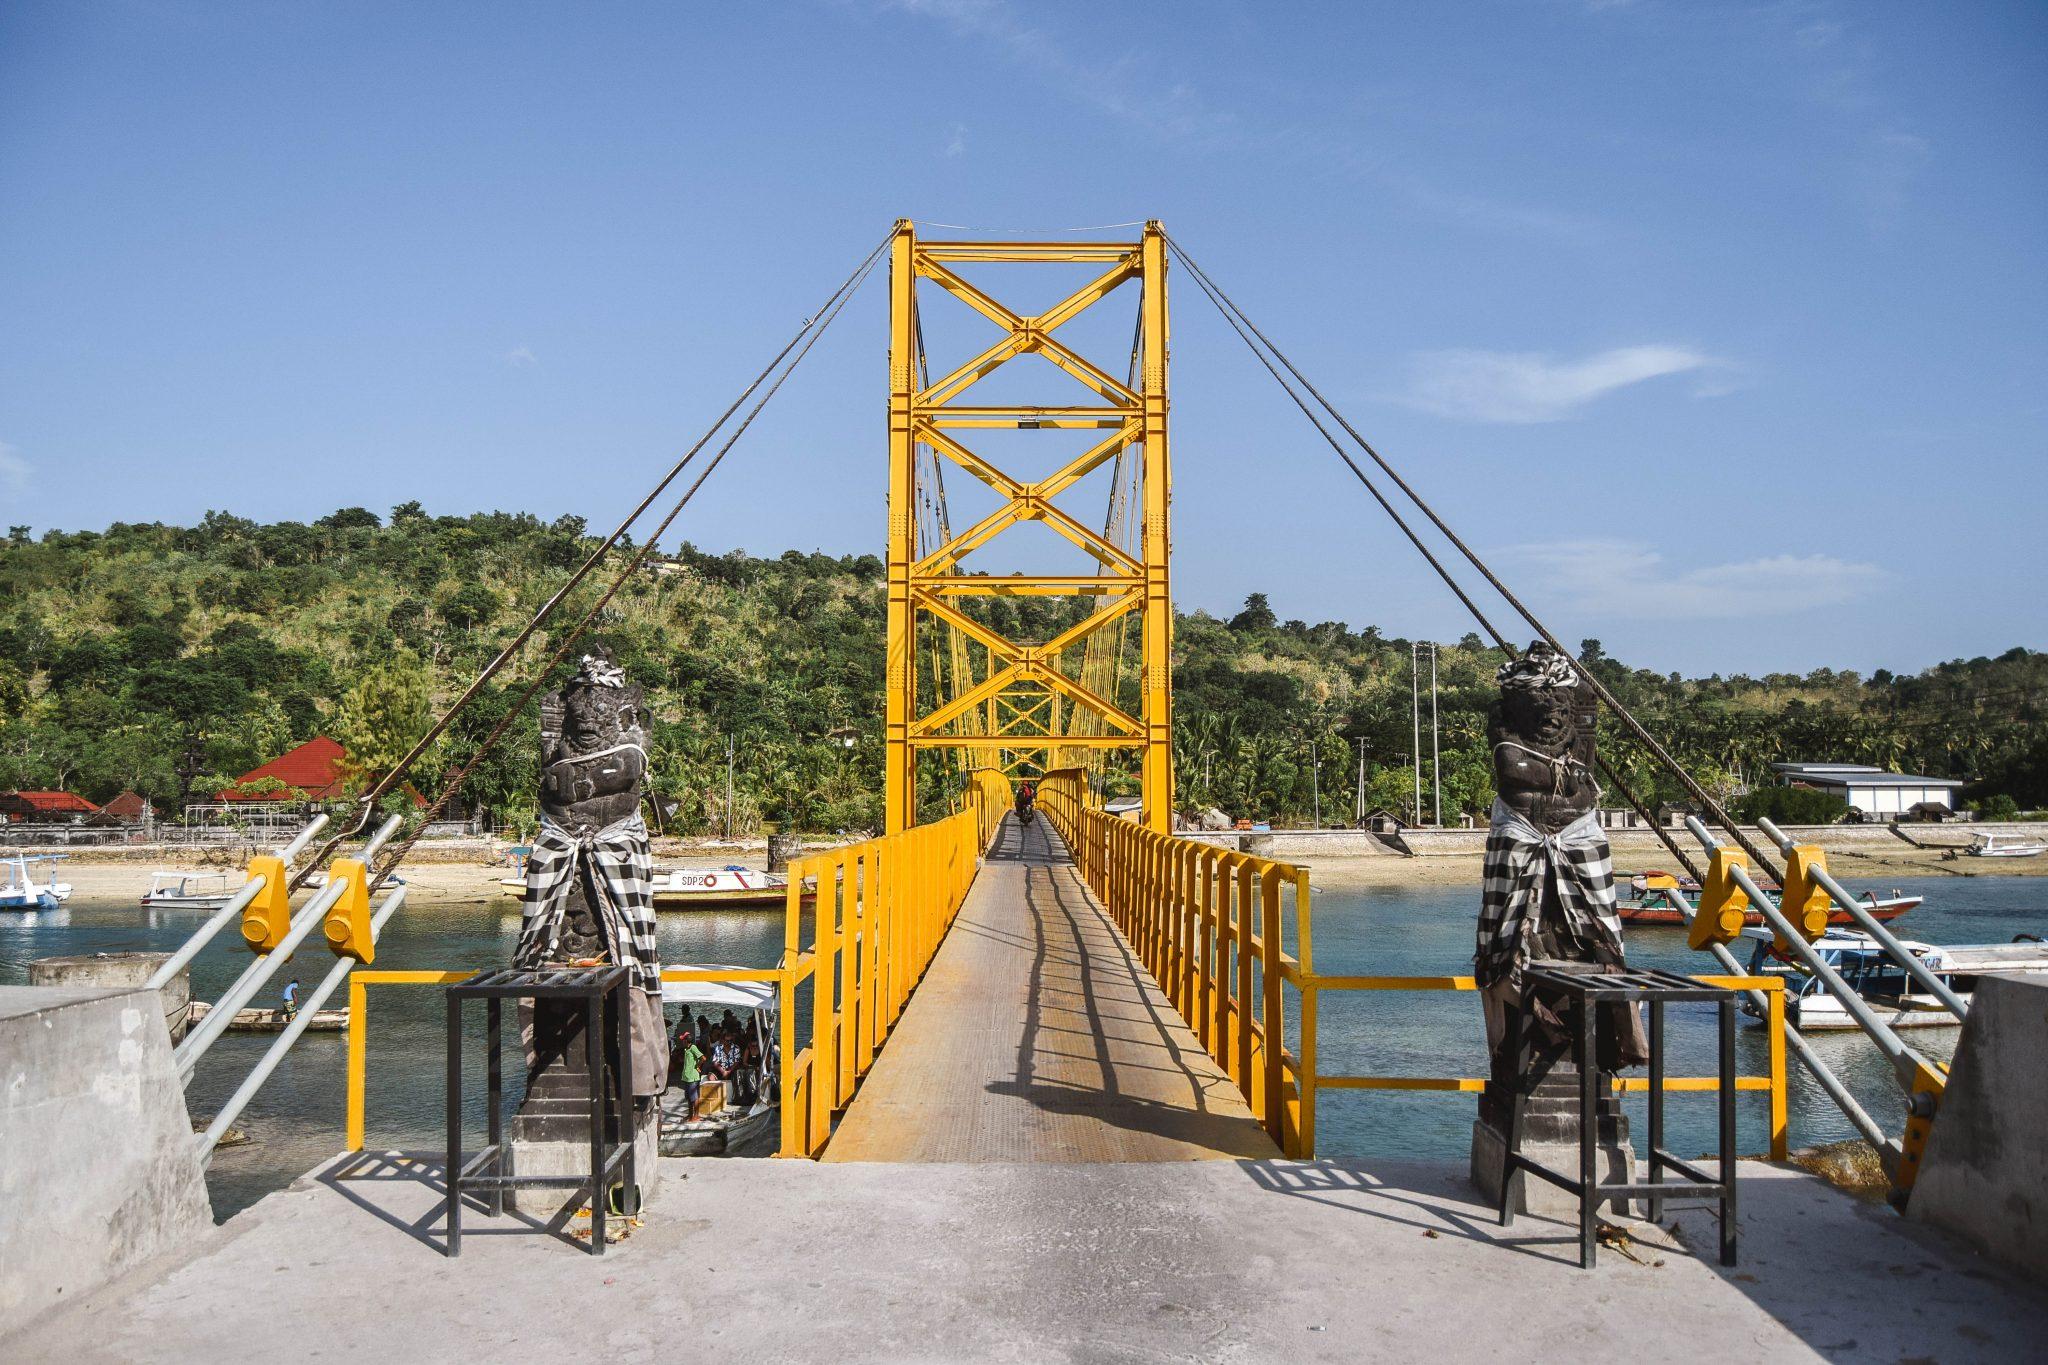 Wanderers & Warriors - The Yellow Bridge Nusa Lembongan To Cenengan - Yellow Bridge Lembongan Bali - Things To Do On Nusa Lembongan